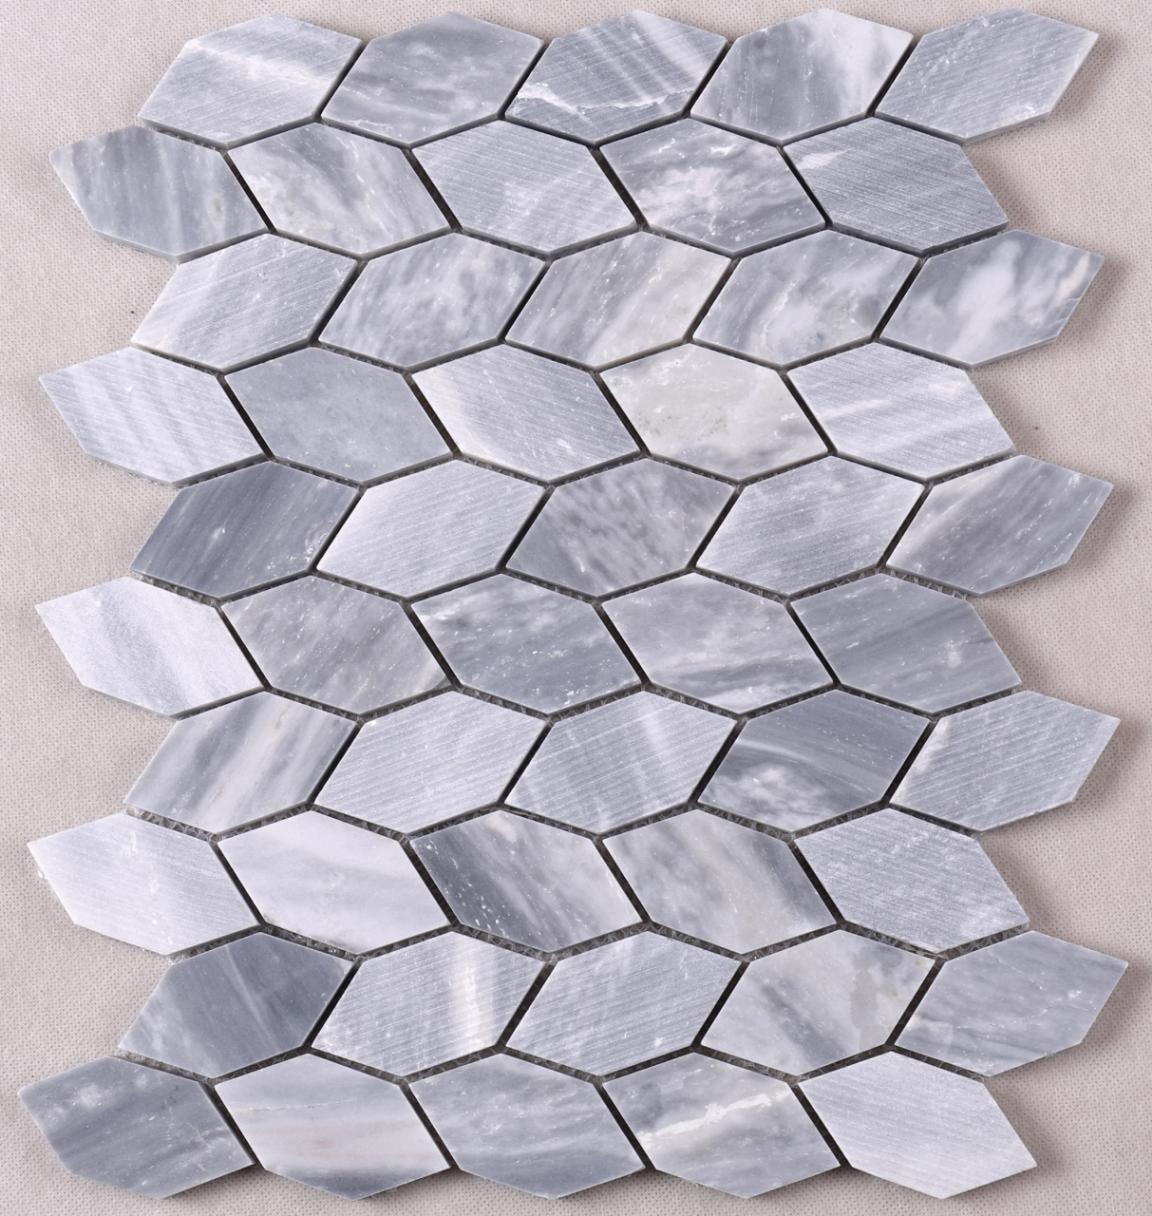 Heng Xing floor travertine stone inquire now for backsplash-1